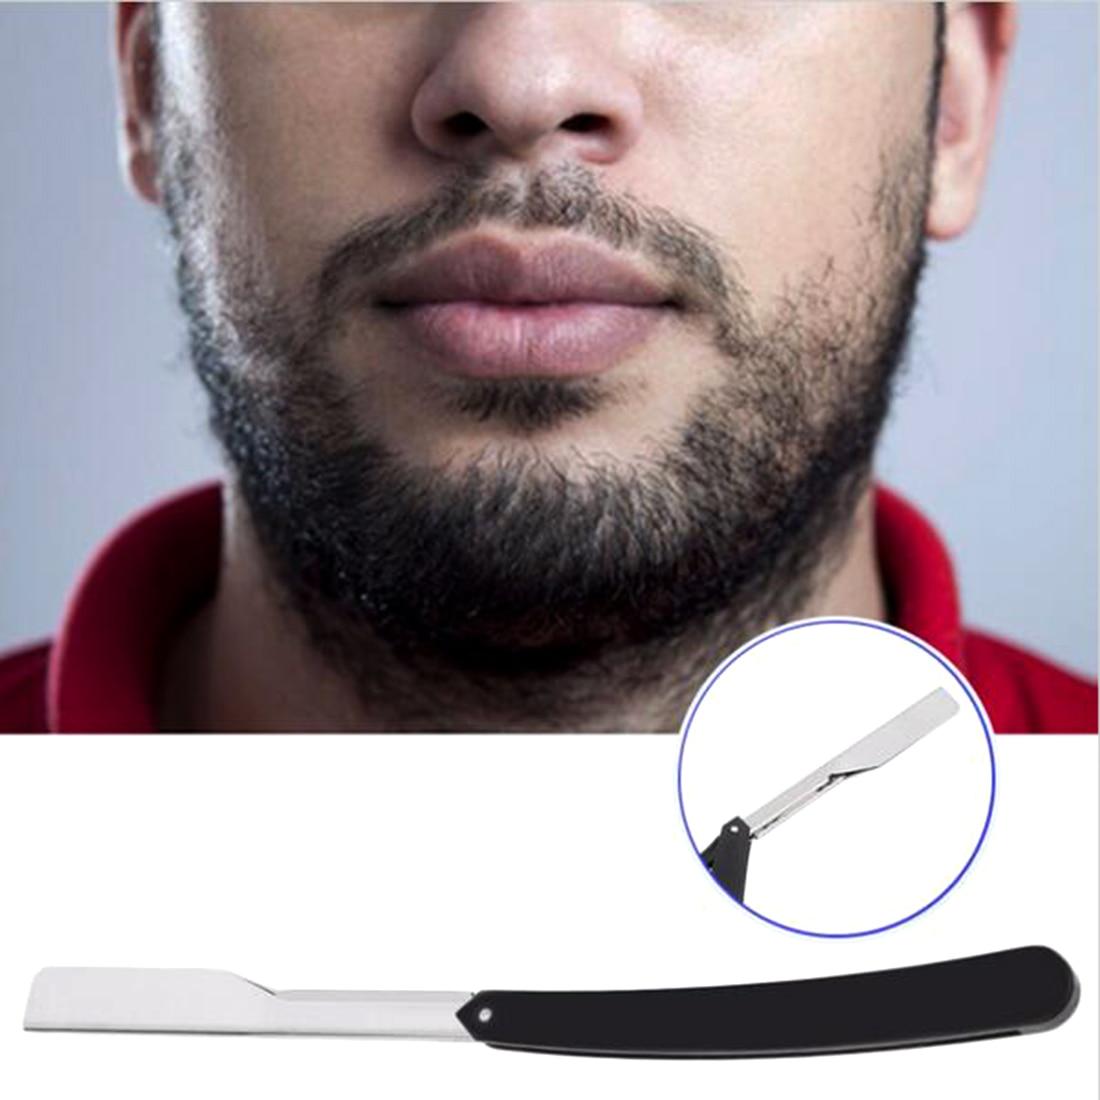 Straight Stainless Steel/Plastic Barber Razor Folding Shaving Razor Hair Removal Tools